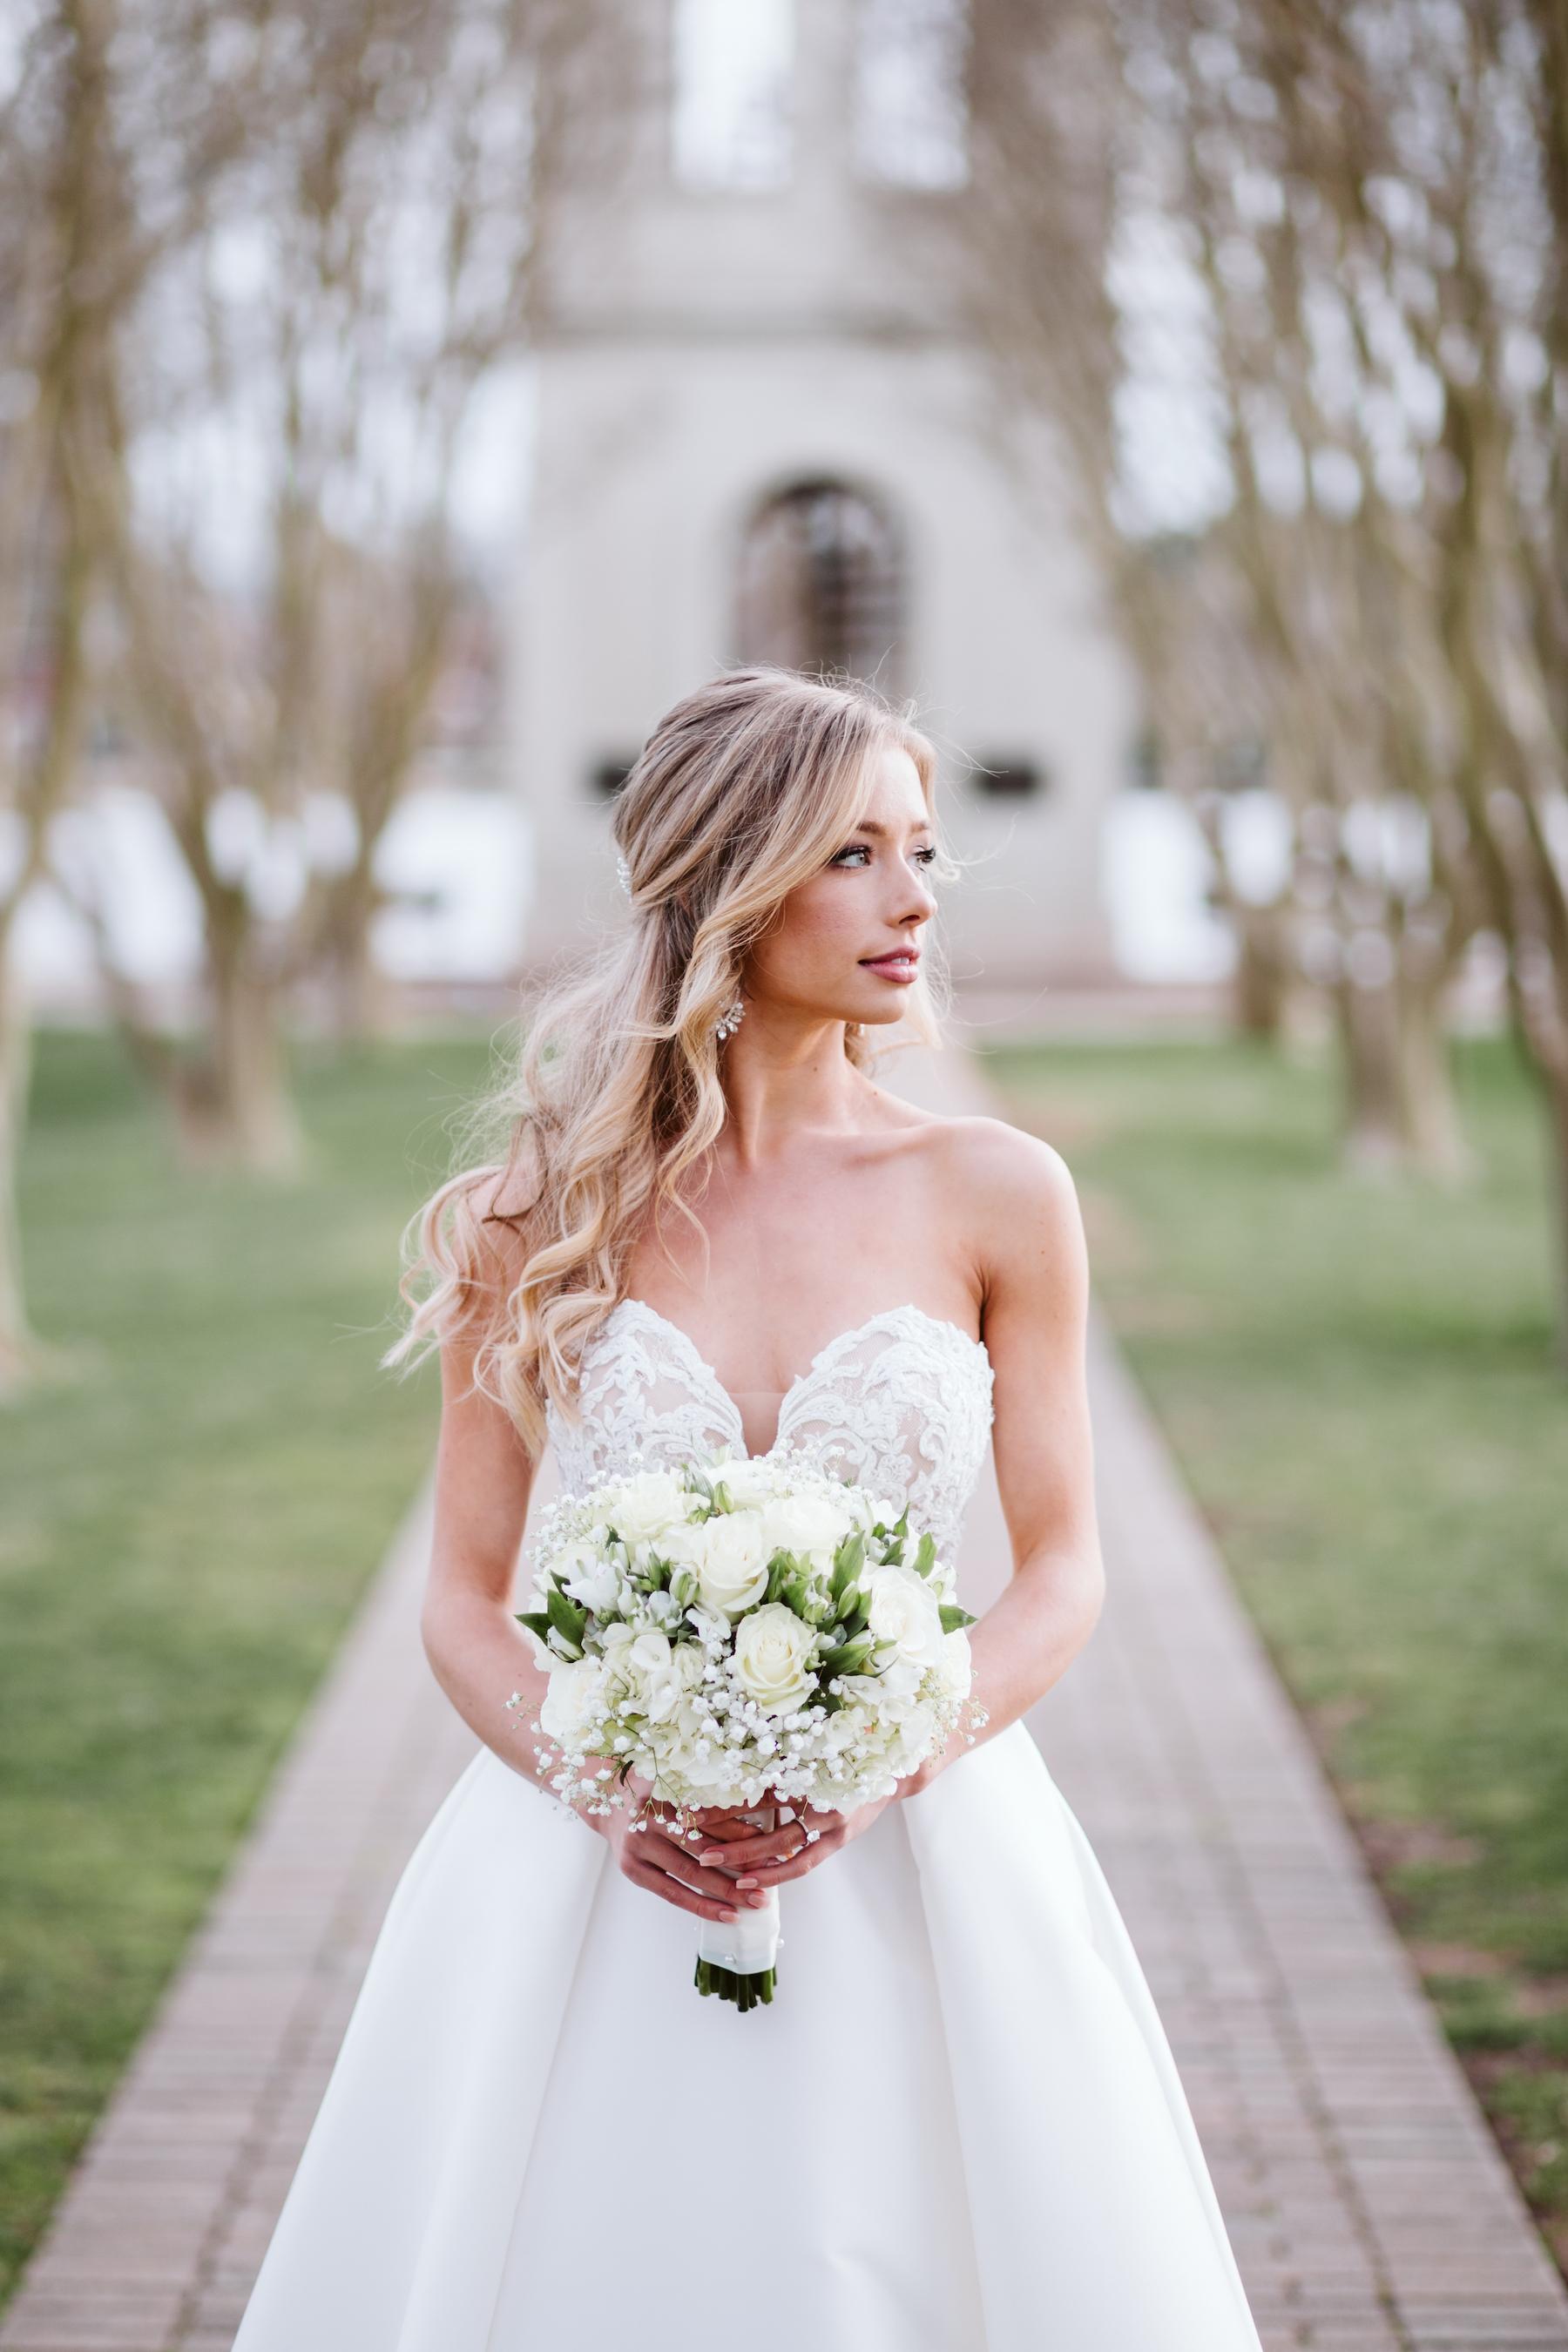 furman-university-bridals-paige-205.JPG